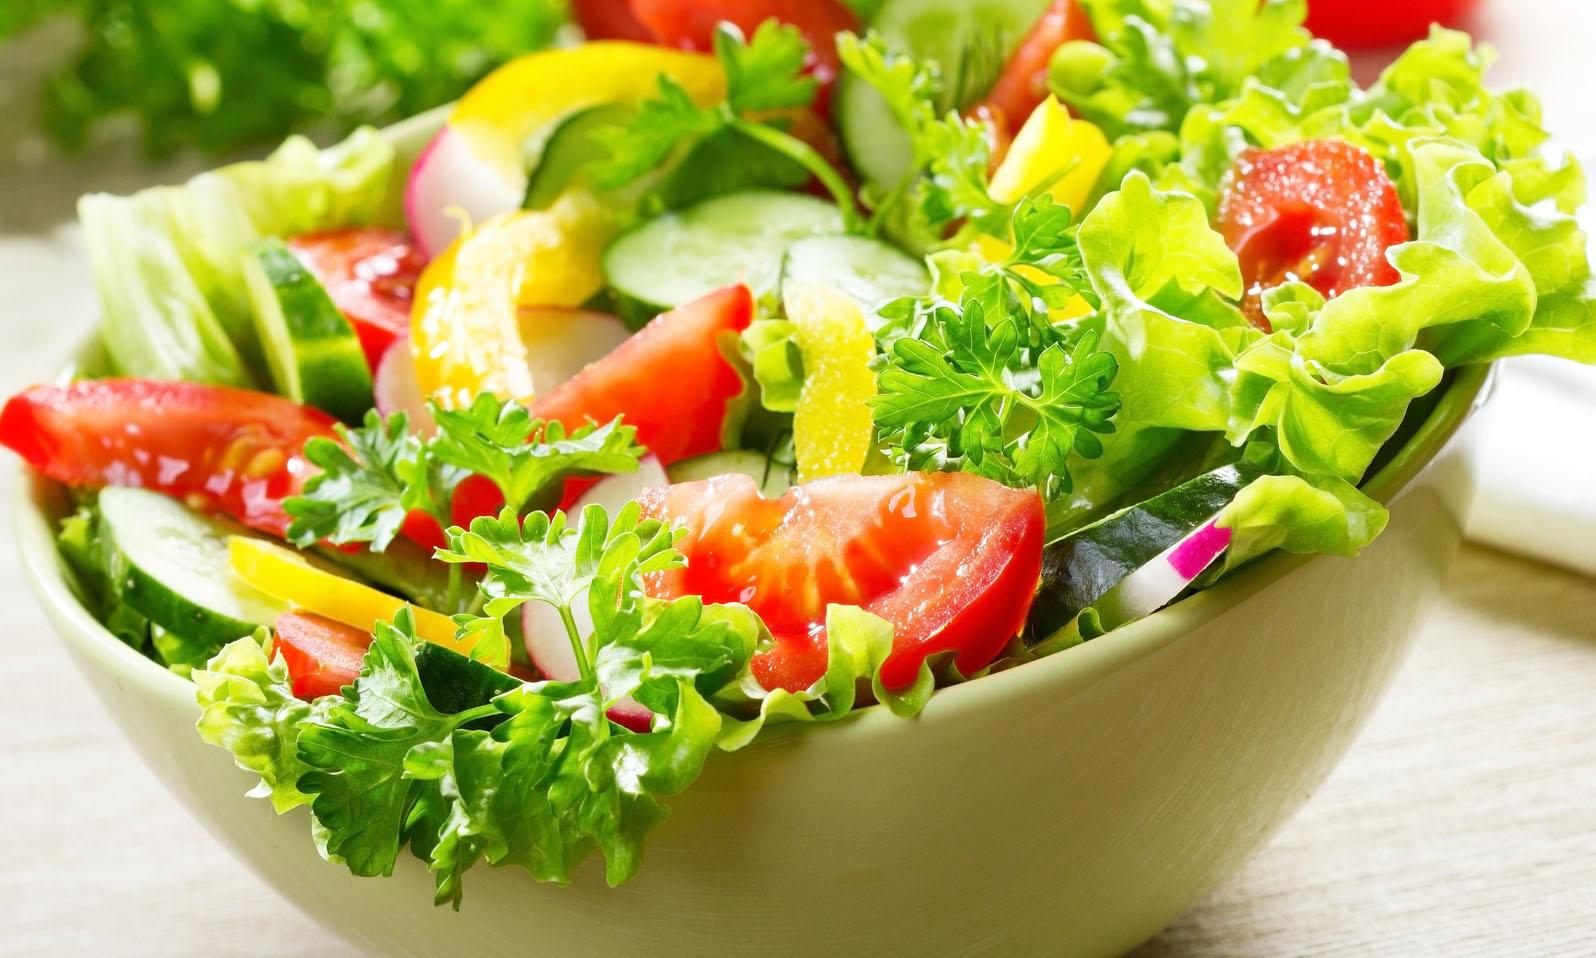 giảm cân rau spa ngoc trinh